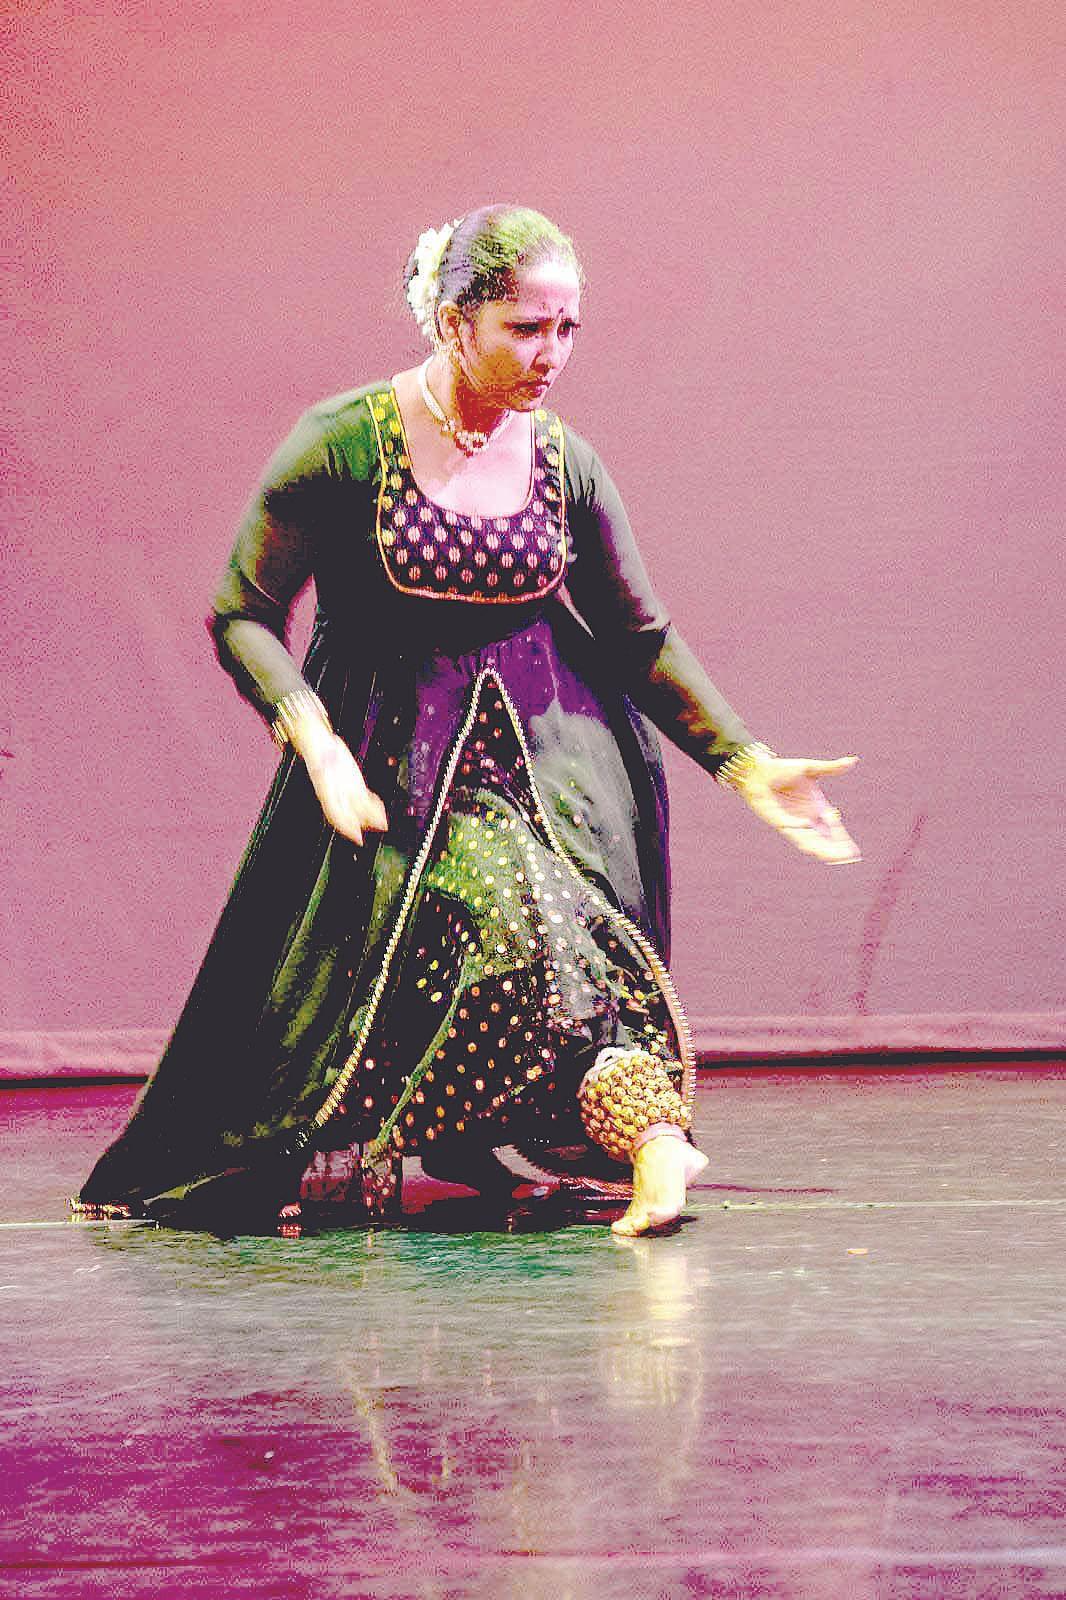 'Mahadeva' at Watermans Theatre in London